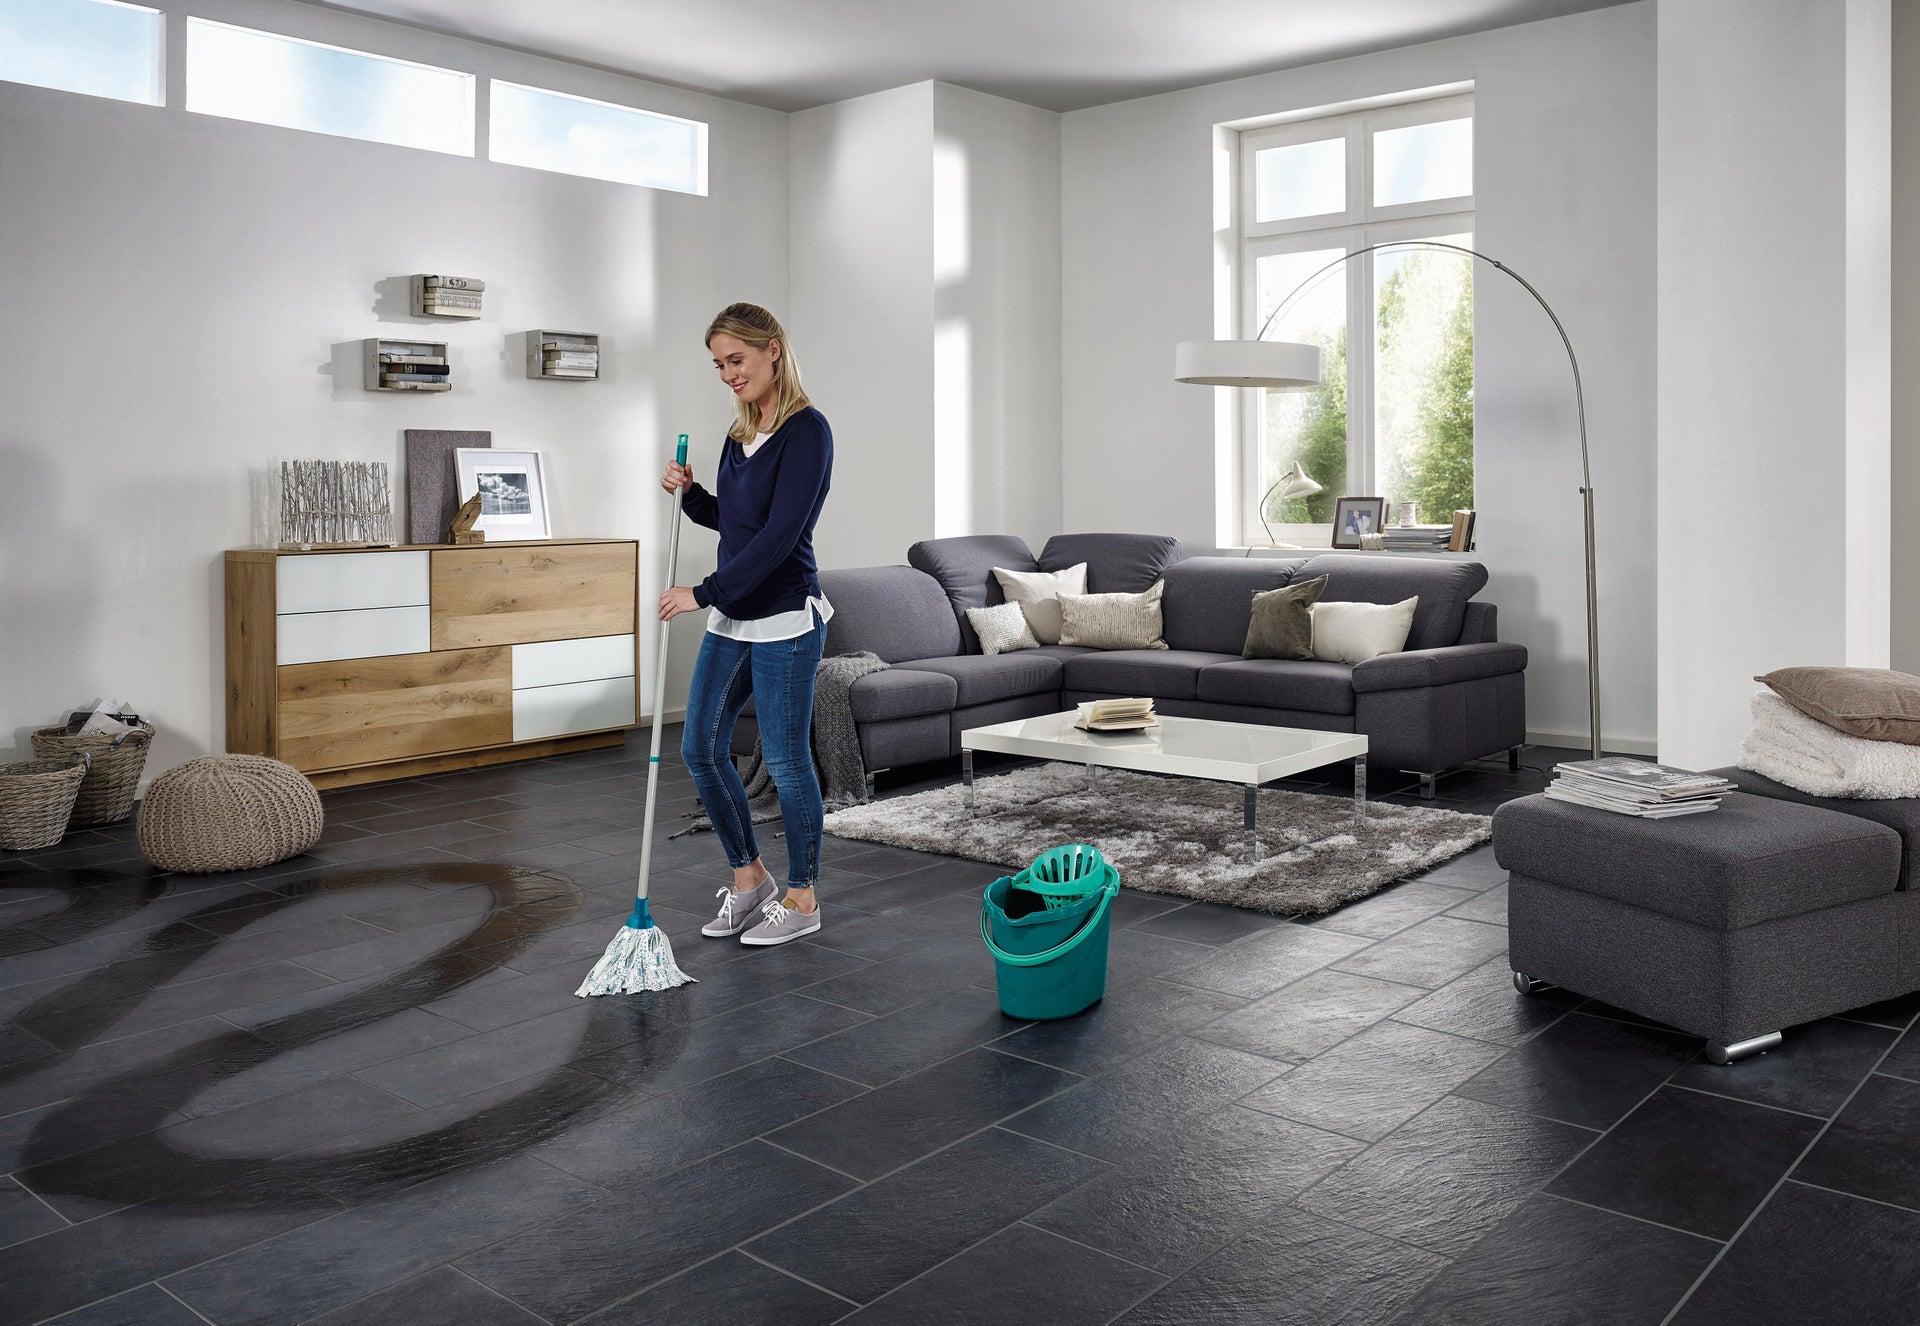 Mocio LEIFHEIT Set lavapavimenti Classic Mop in cotone - 1